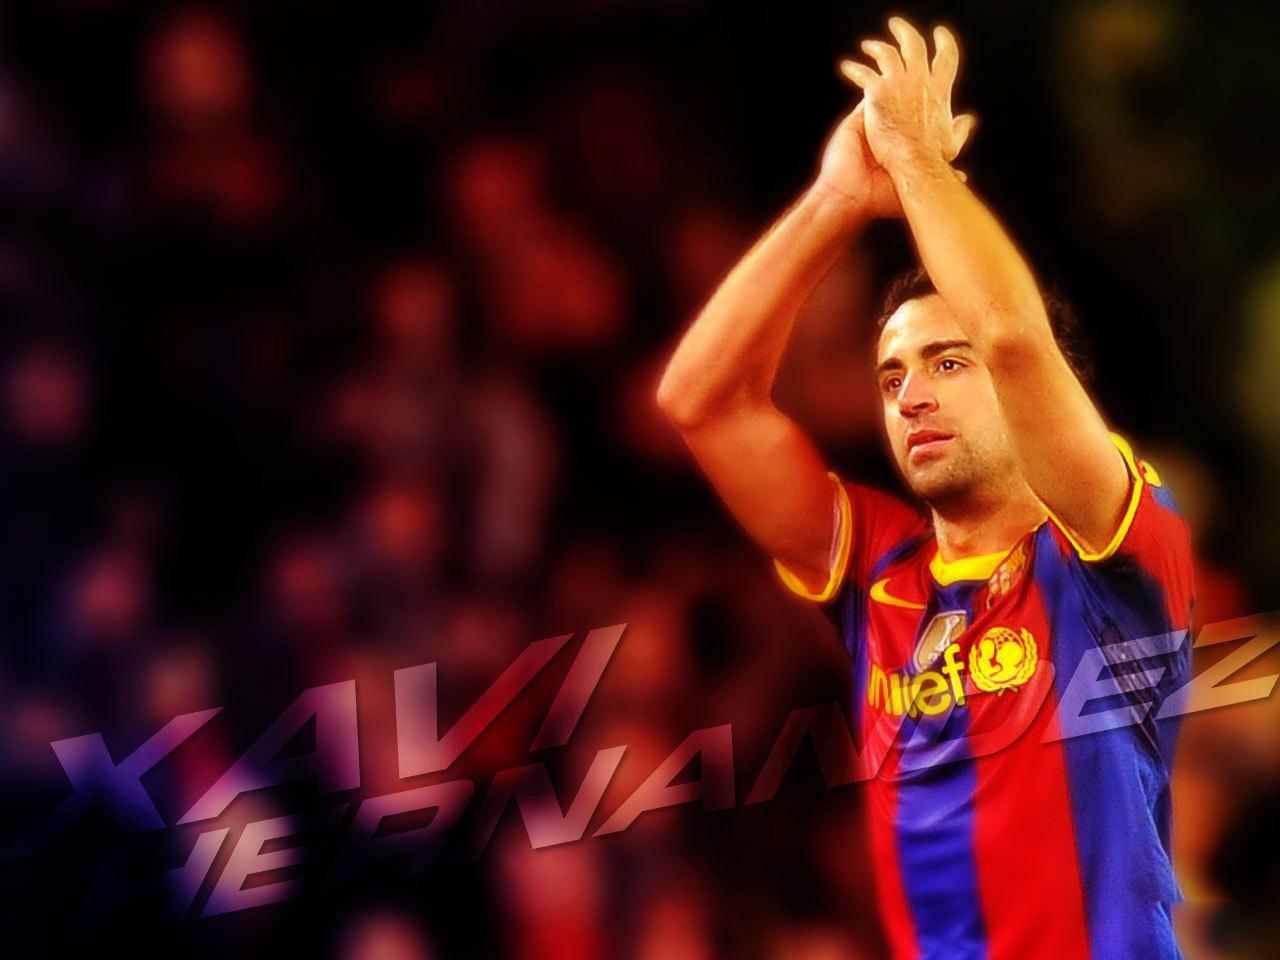 Football Xavi Hernandez hd Wallpapers 2013 1280x960